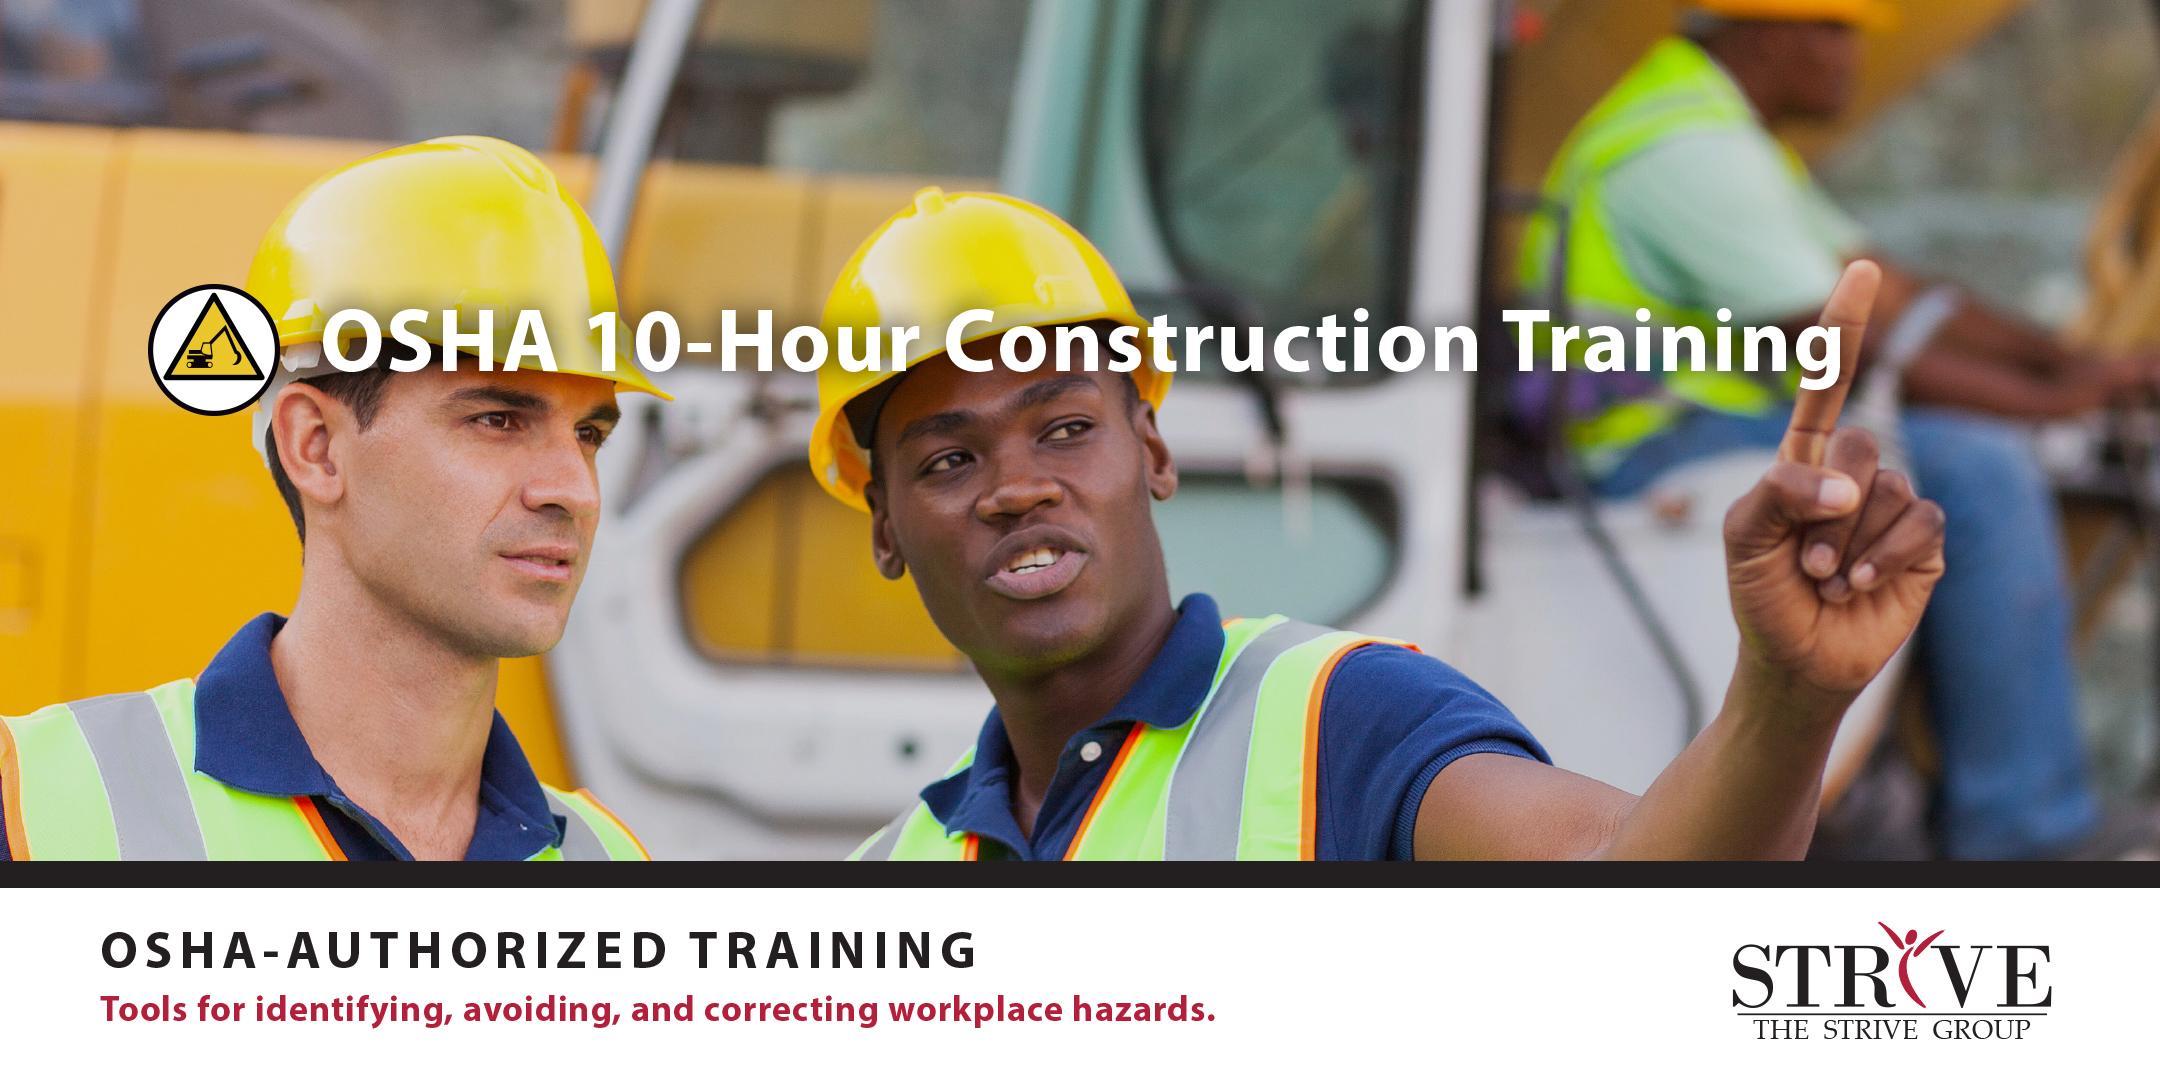 OSHA 10 - Hour Construction Training